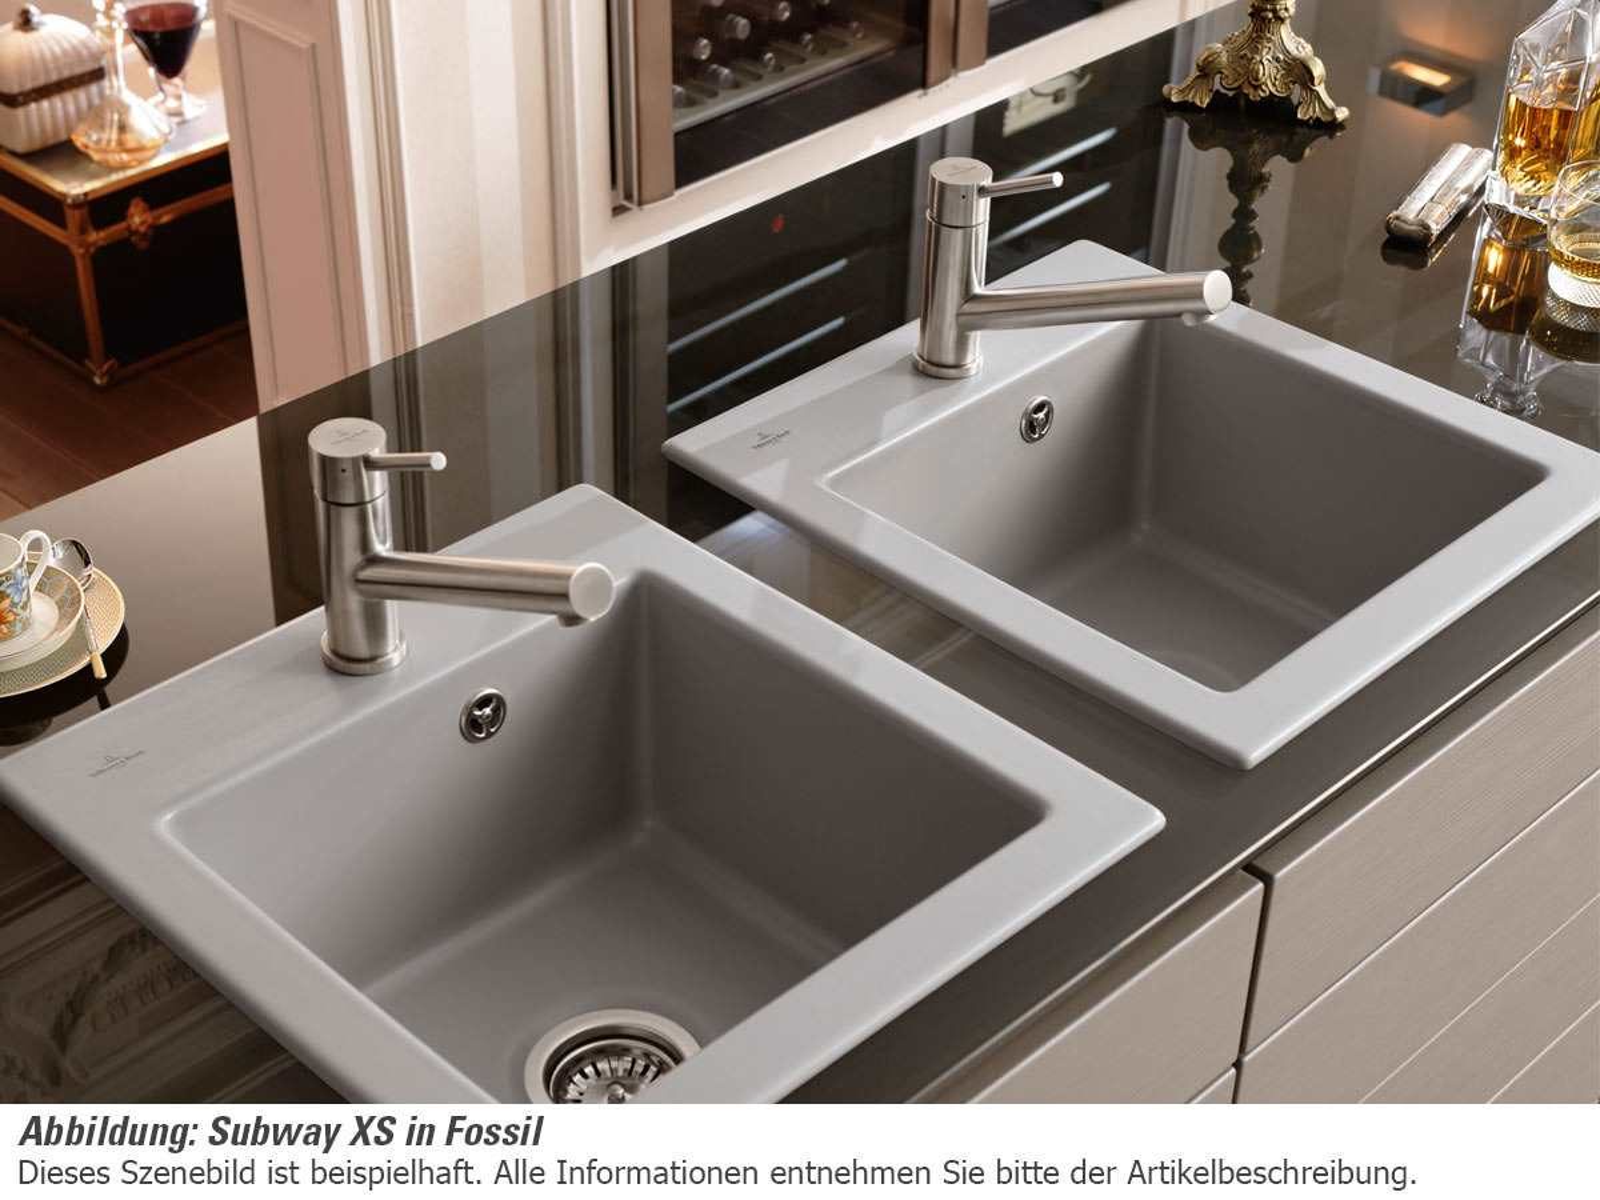 Villeroy & Boch Subway 45 XS Chromit - 6781 01 J0 Keramikspüle Handbetätigung